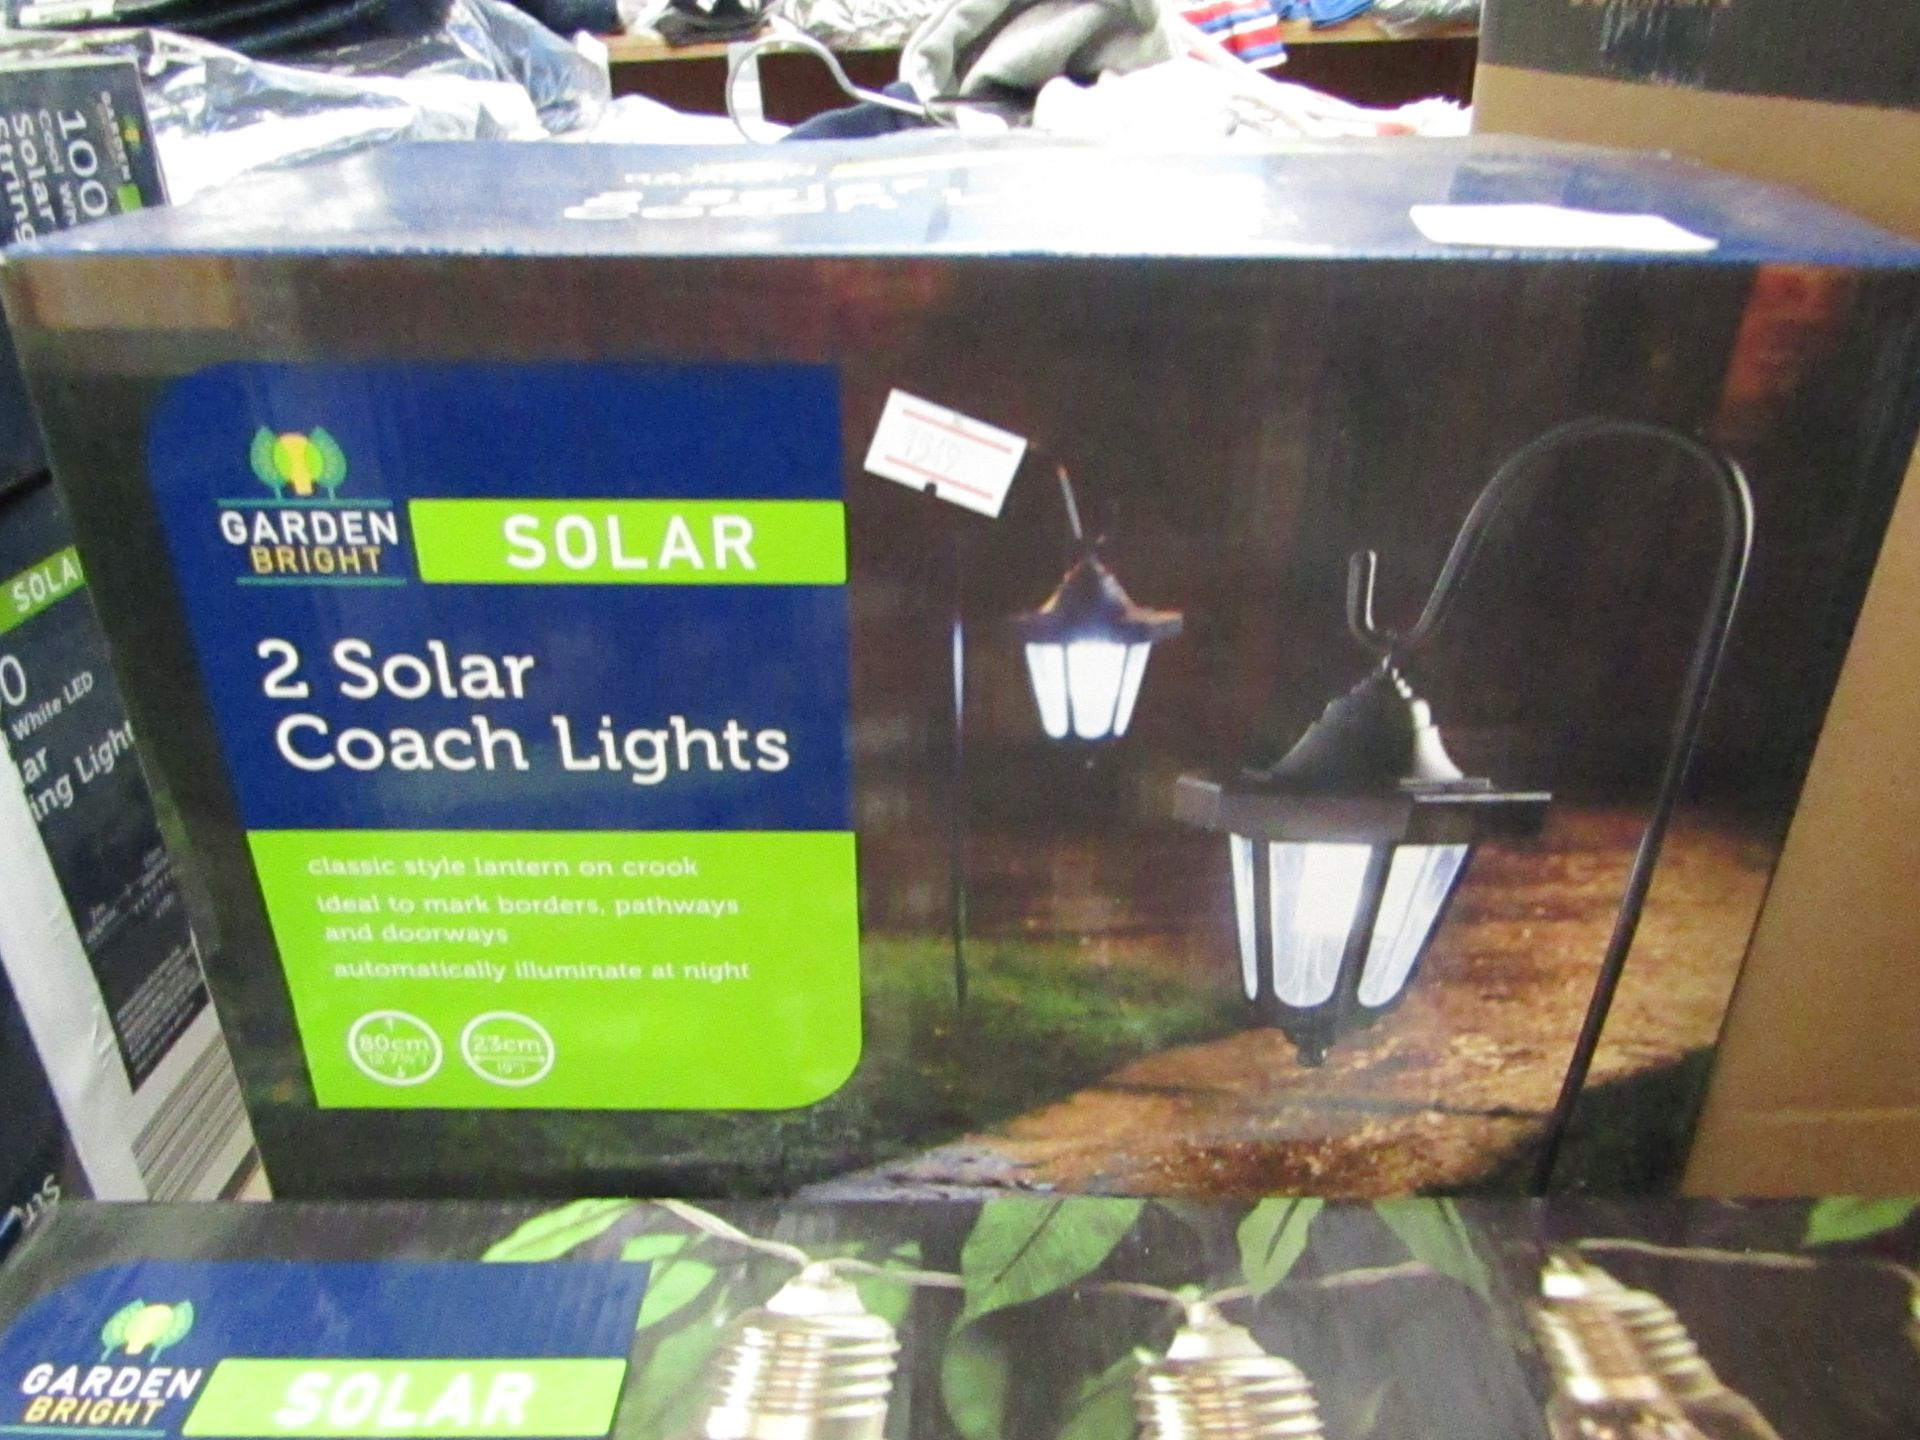 Lot 11 - 2 SOLAR Coach Lights, Automatically Illuminate at night. Boxed